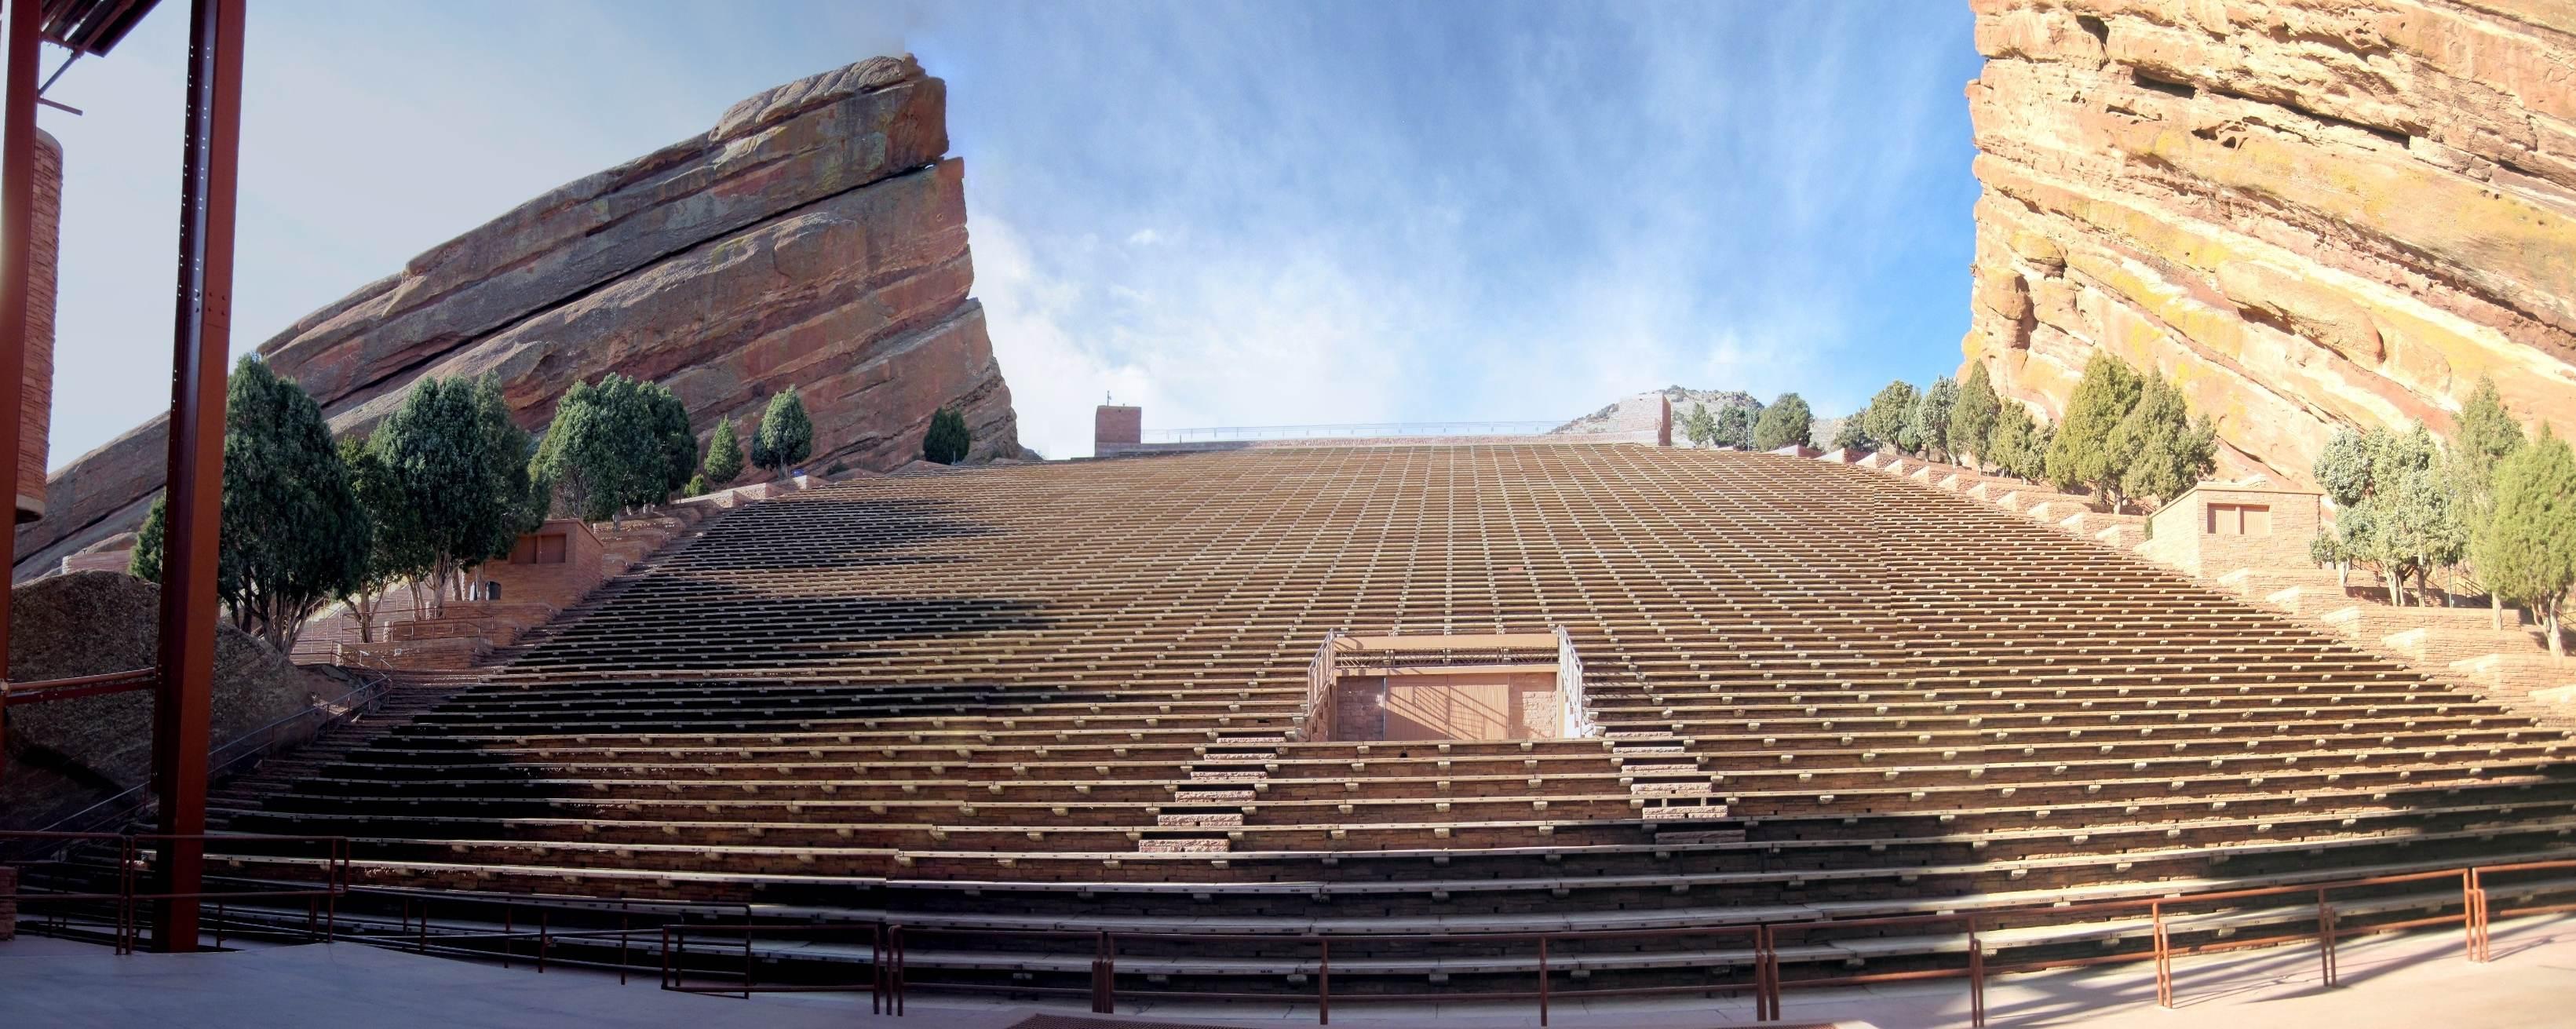 Red Rocks Concerts Denver Broomfield Morrison Amphitheatre